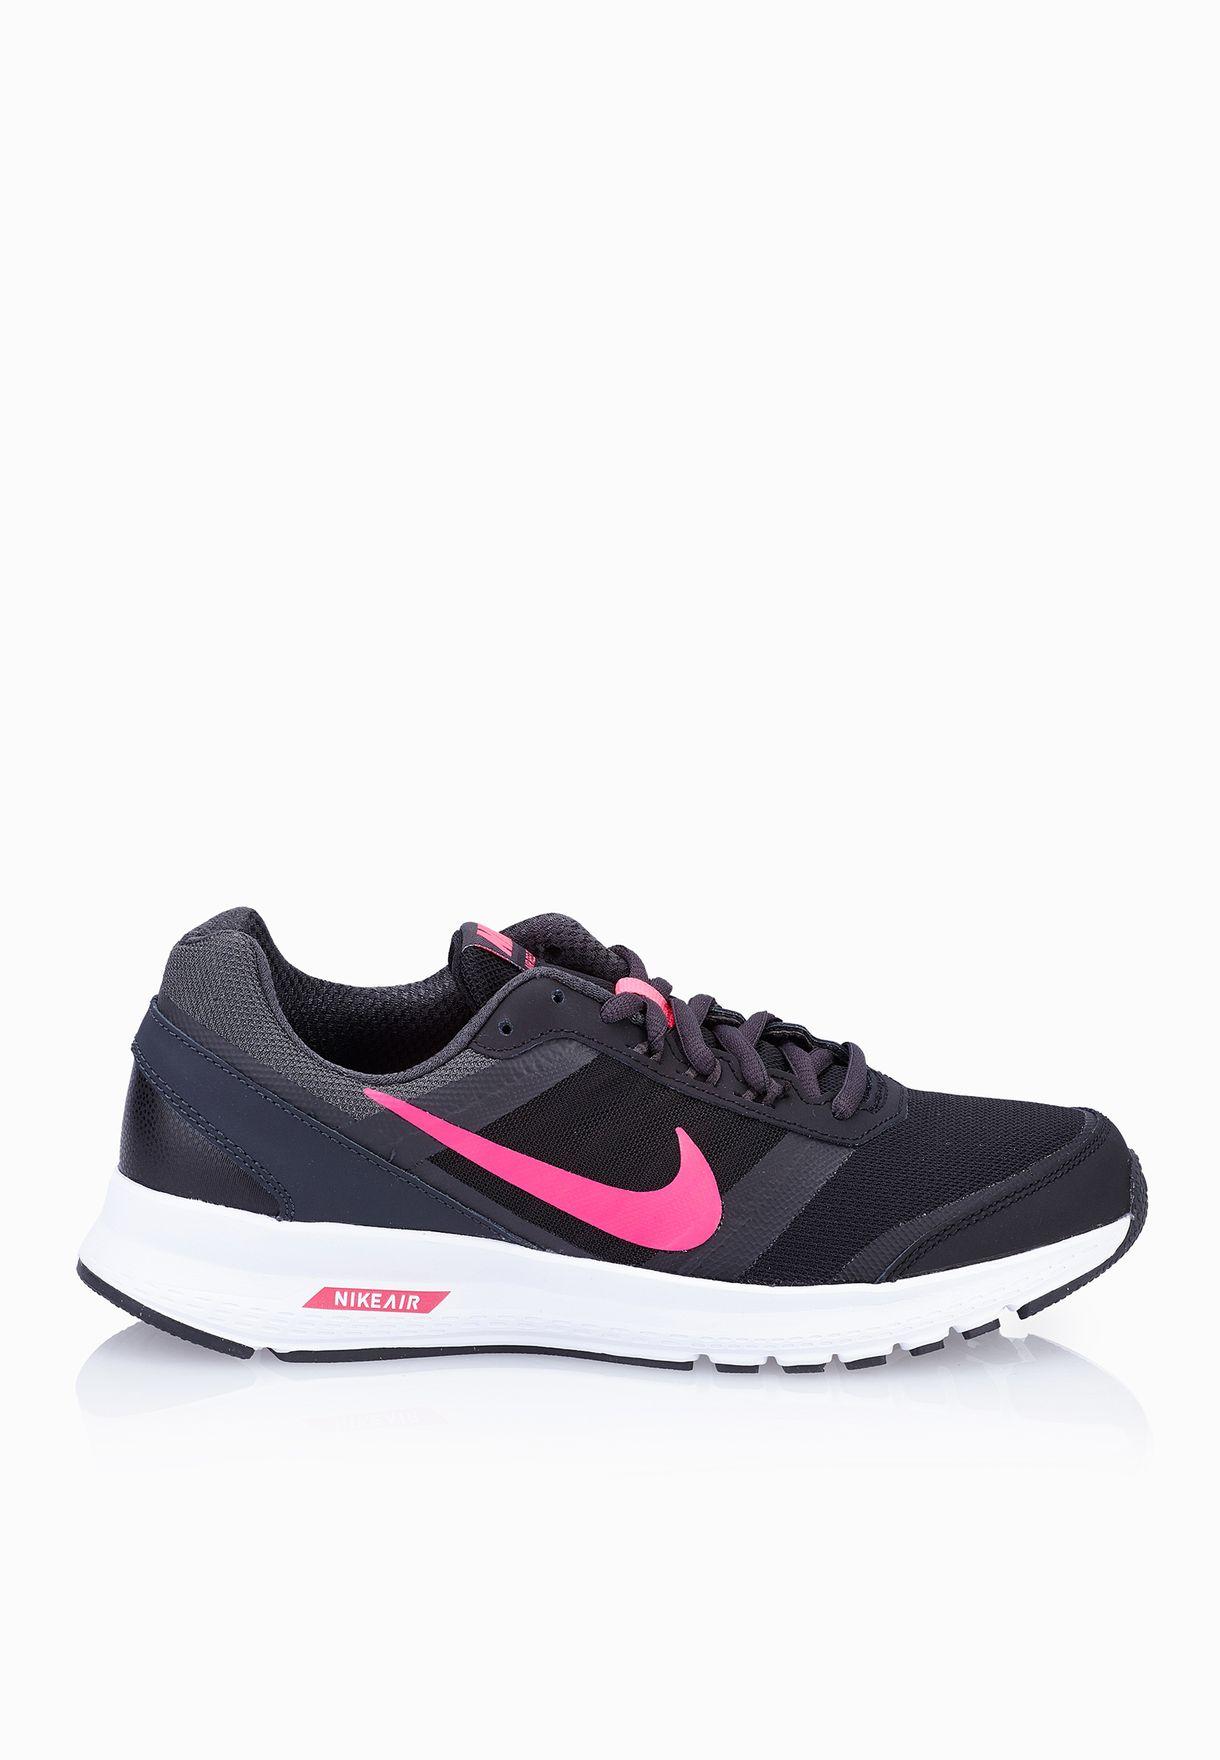 9aac253c9e1ee Shop Nike black Air Relentless 5 807098-005 for Women in UAE ...